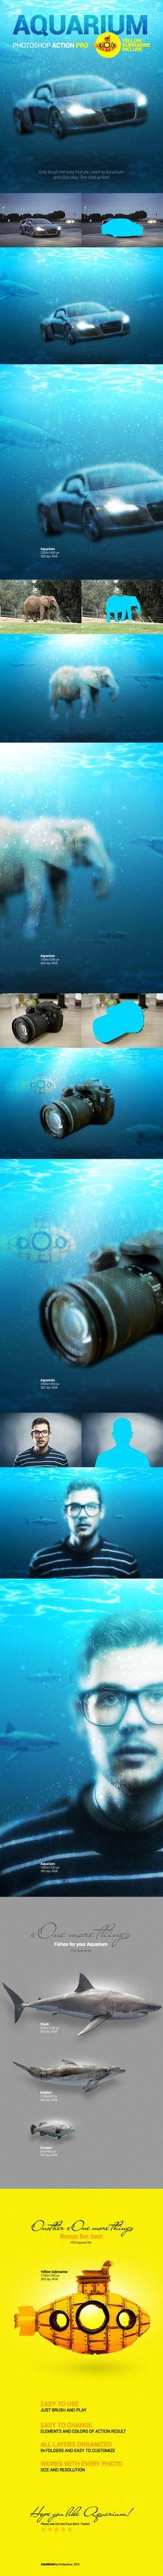 Aquarium PS Action - Photo Effects Actions